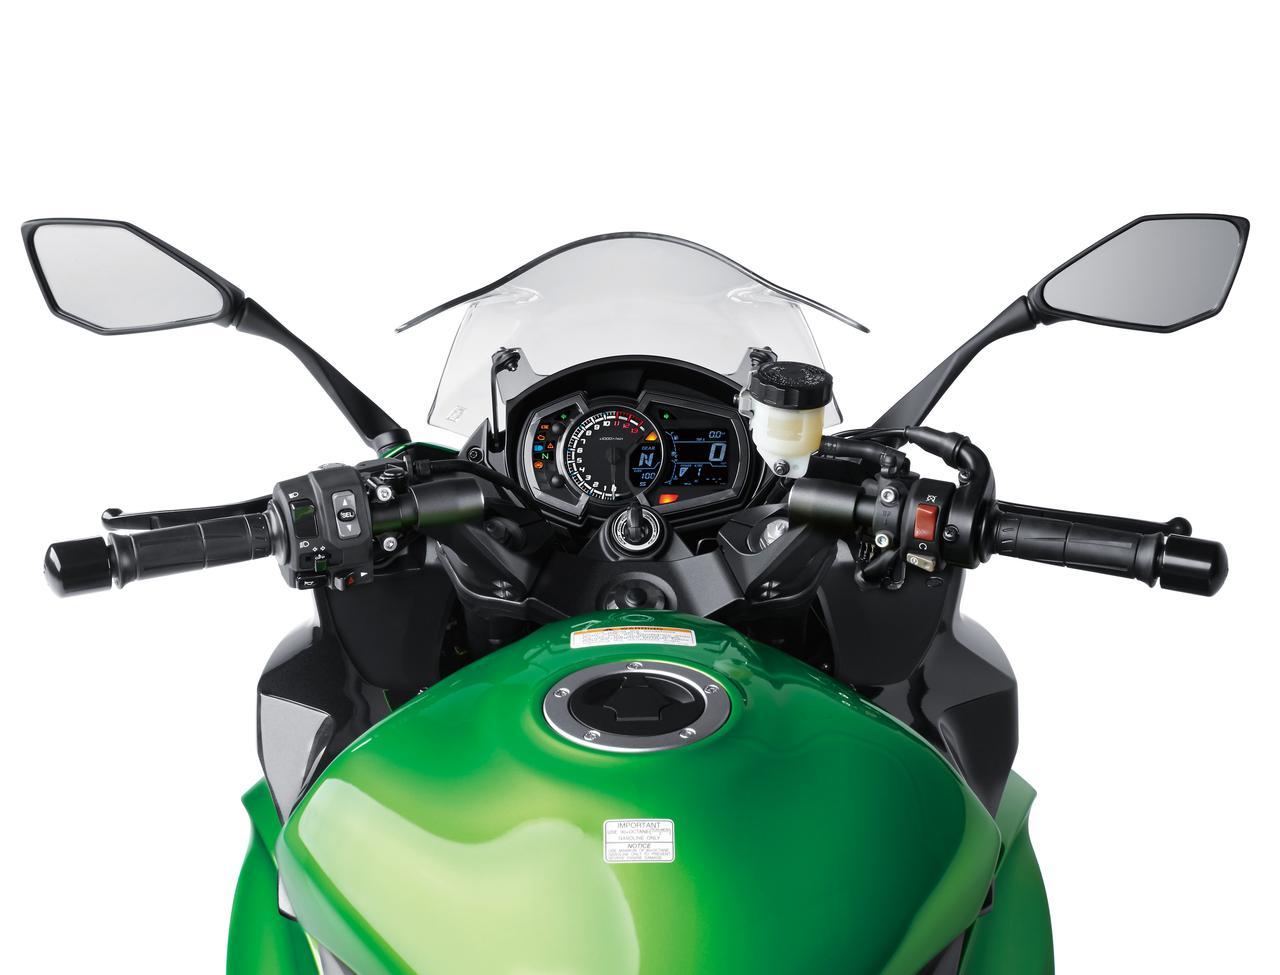 Kawasaki Cc Ninja Adf